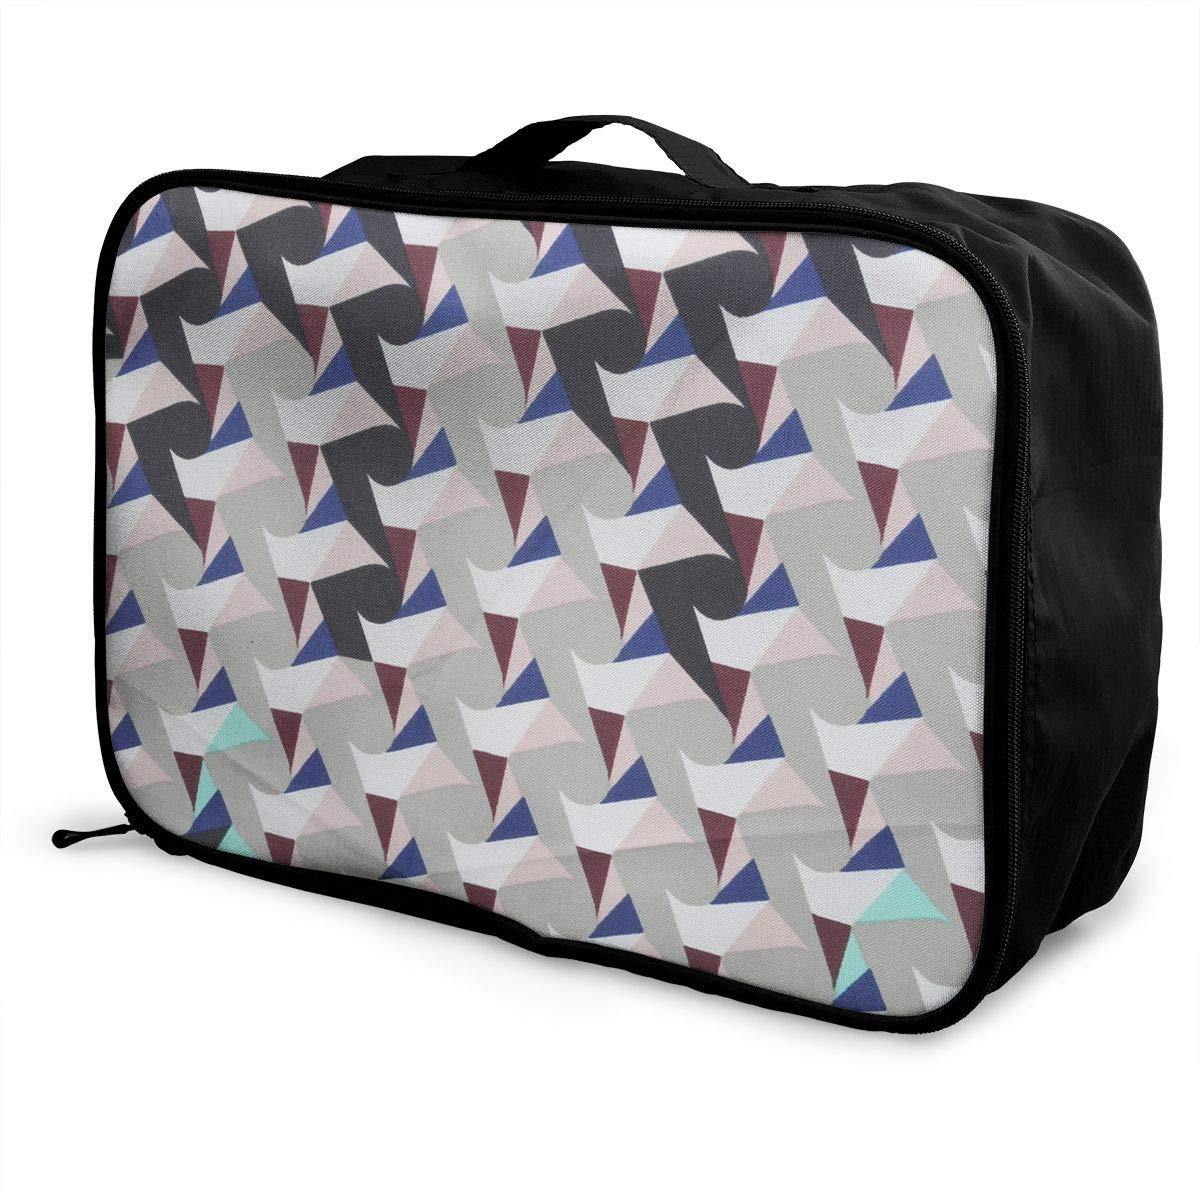 Travel Luggage Duffle Bag Lightweight Portable Handbag Umbrella Pattern Large Capacity Waterproof Foldable Storage Tote